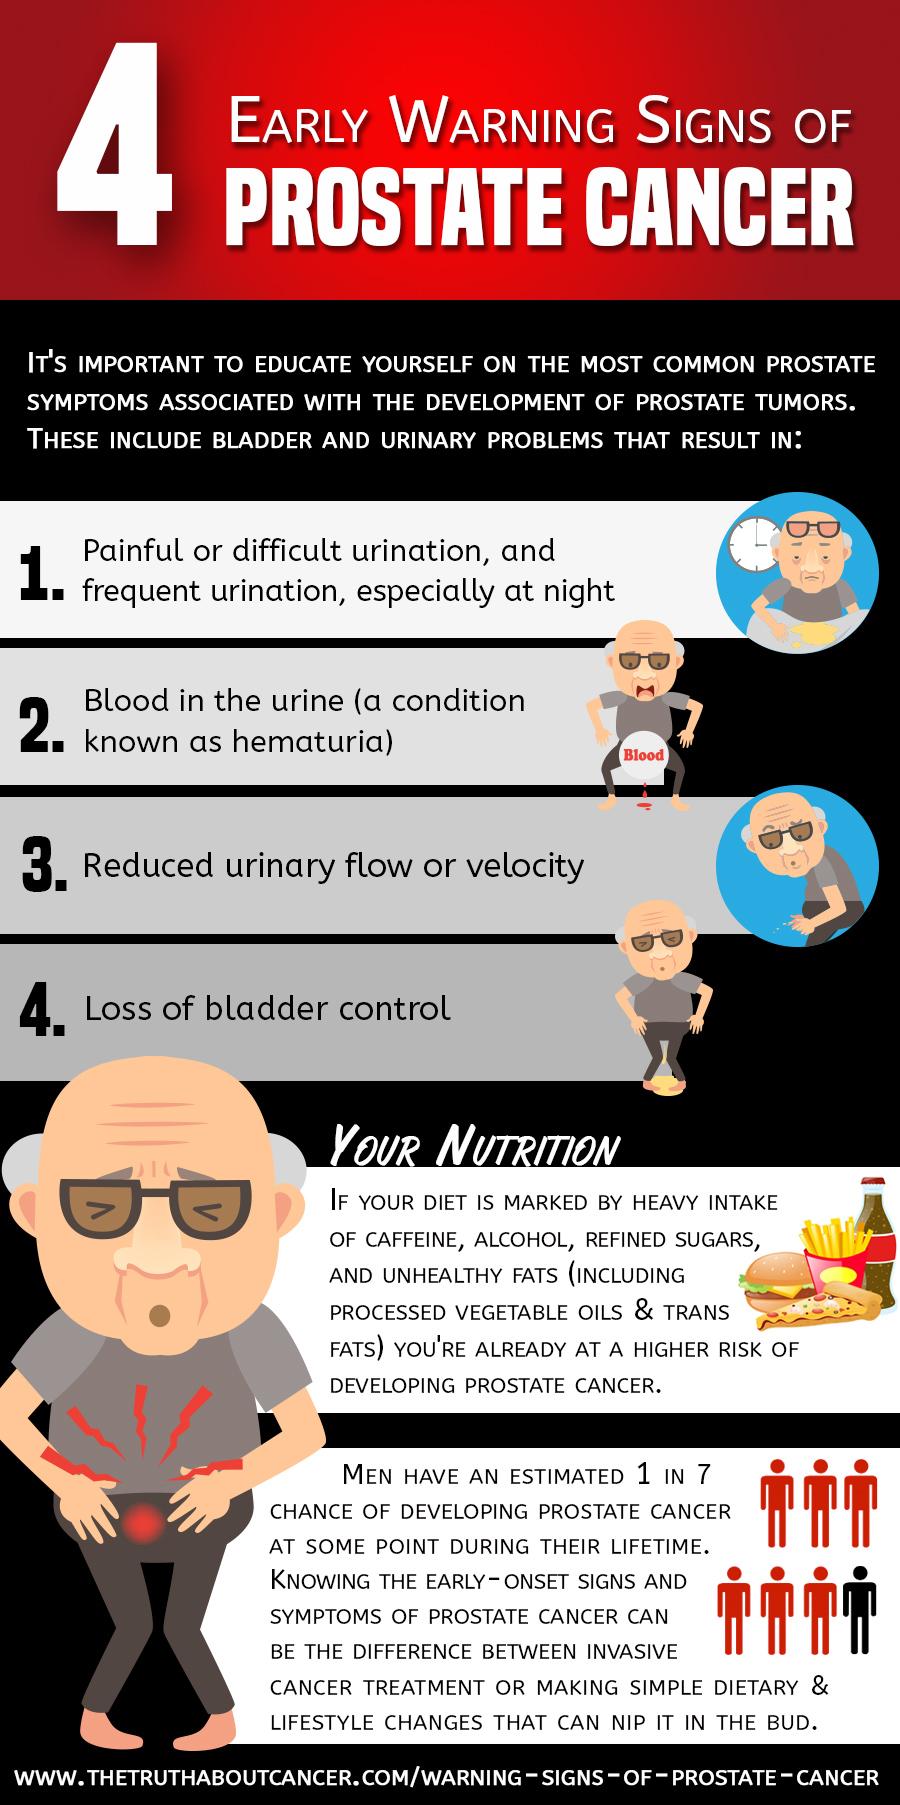 prostate-cancer-warning-signs